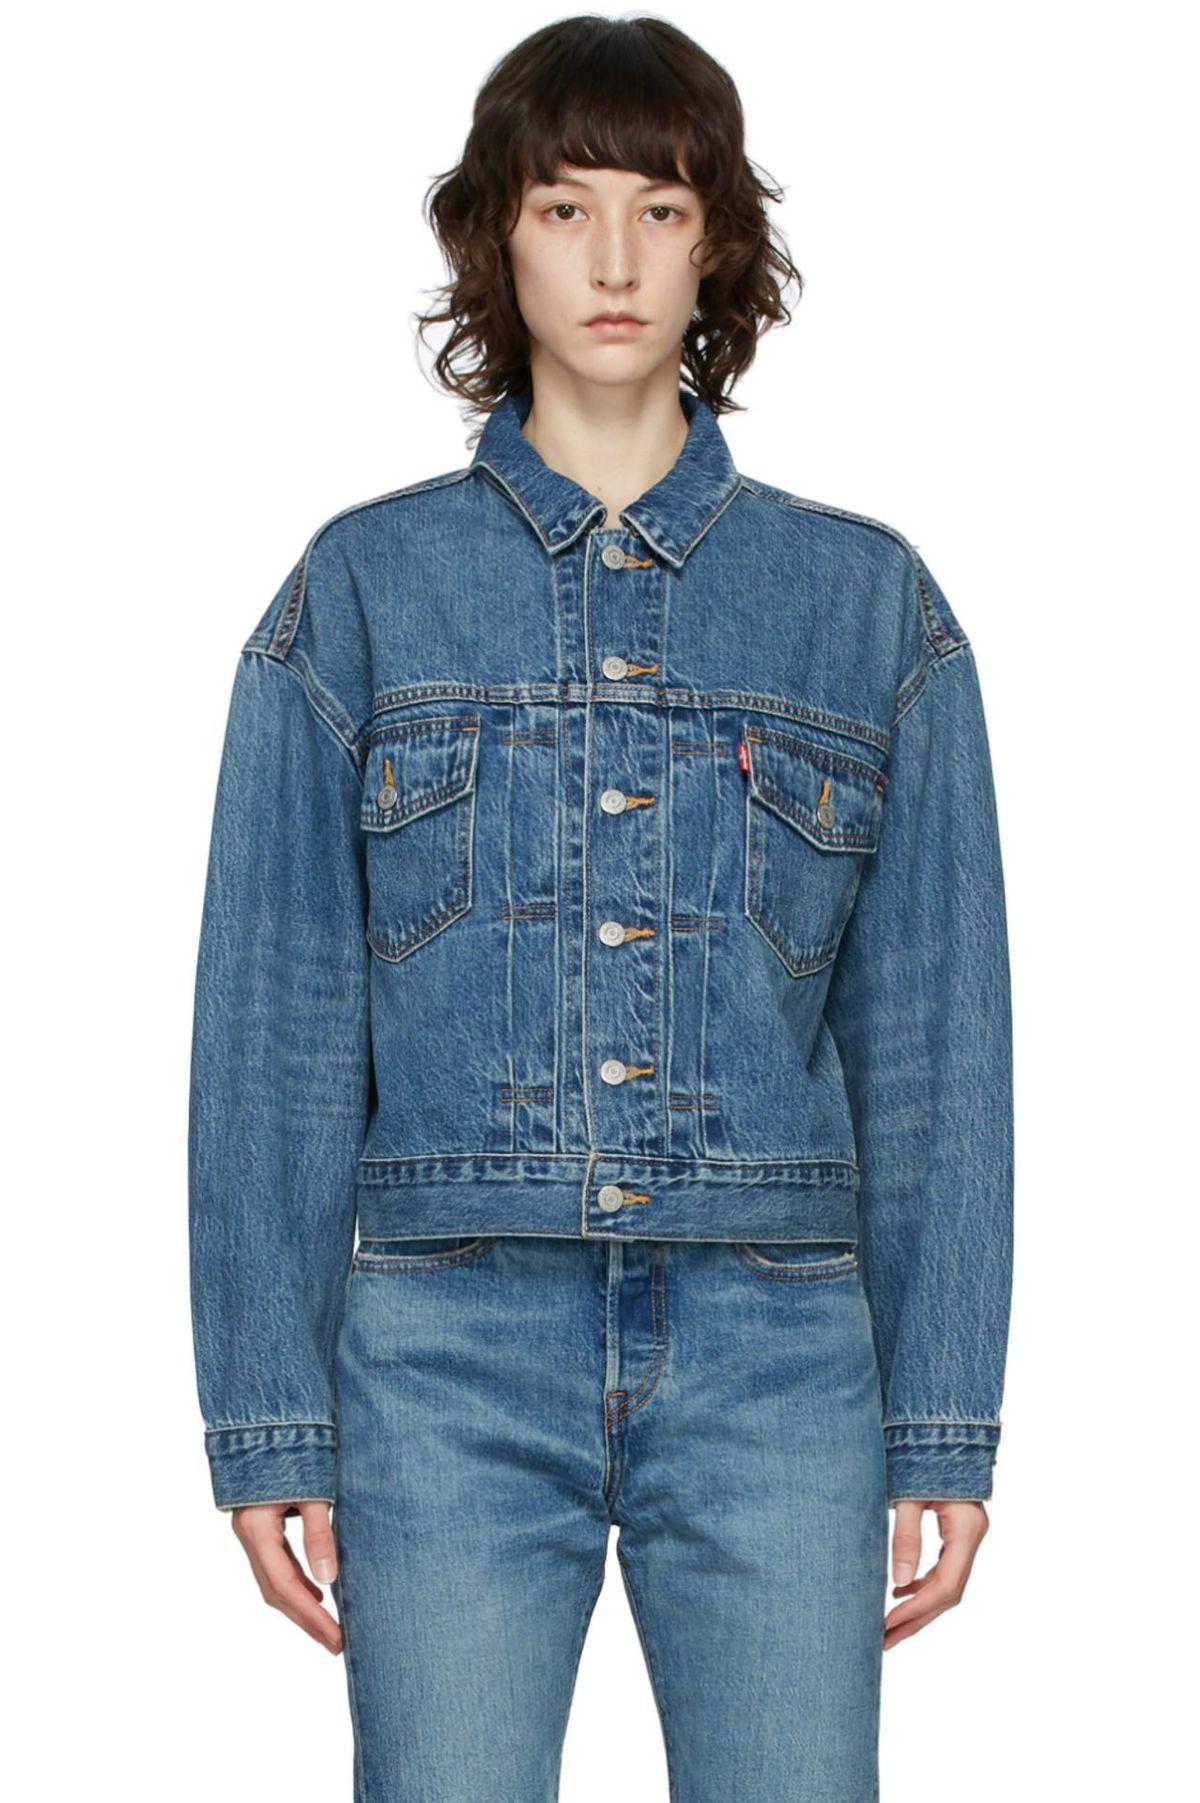 levis denim heritage fit trucker jacket